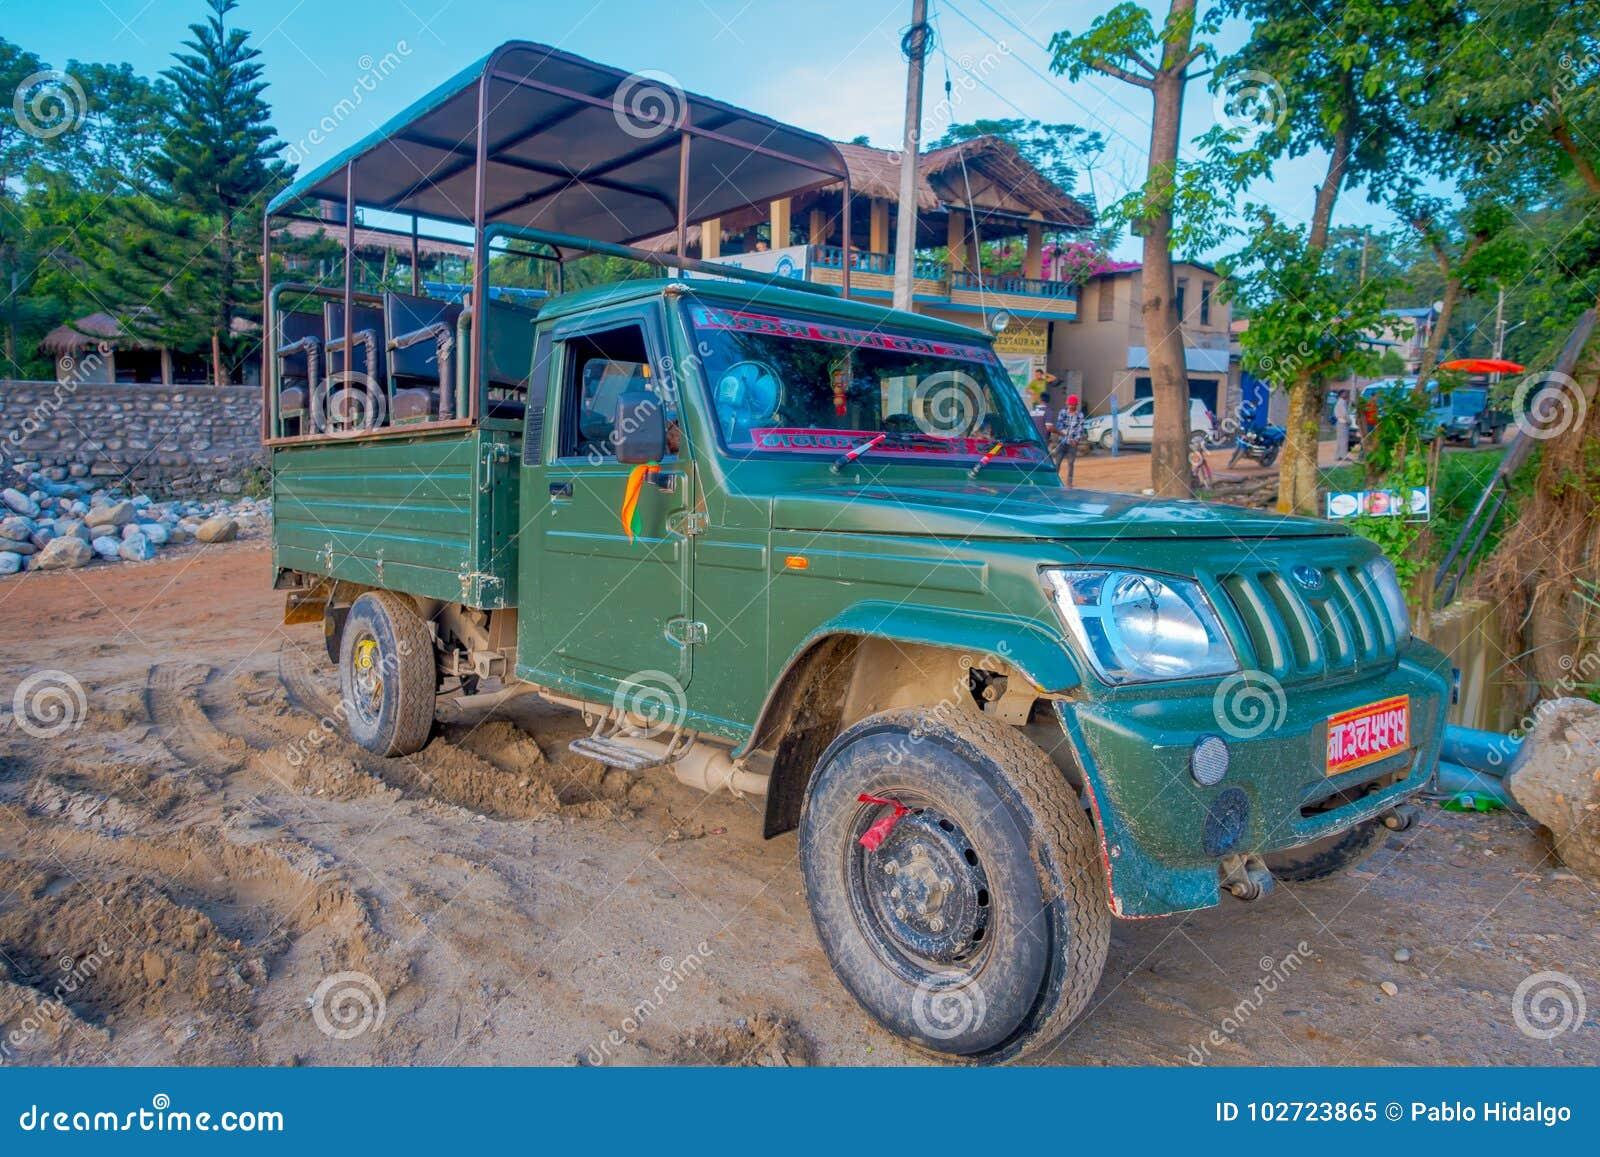 CHITWAN, NEPAL - NOVEMBER 03, 2017: Green Car Parked Waiting For